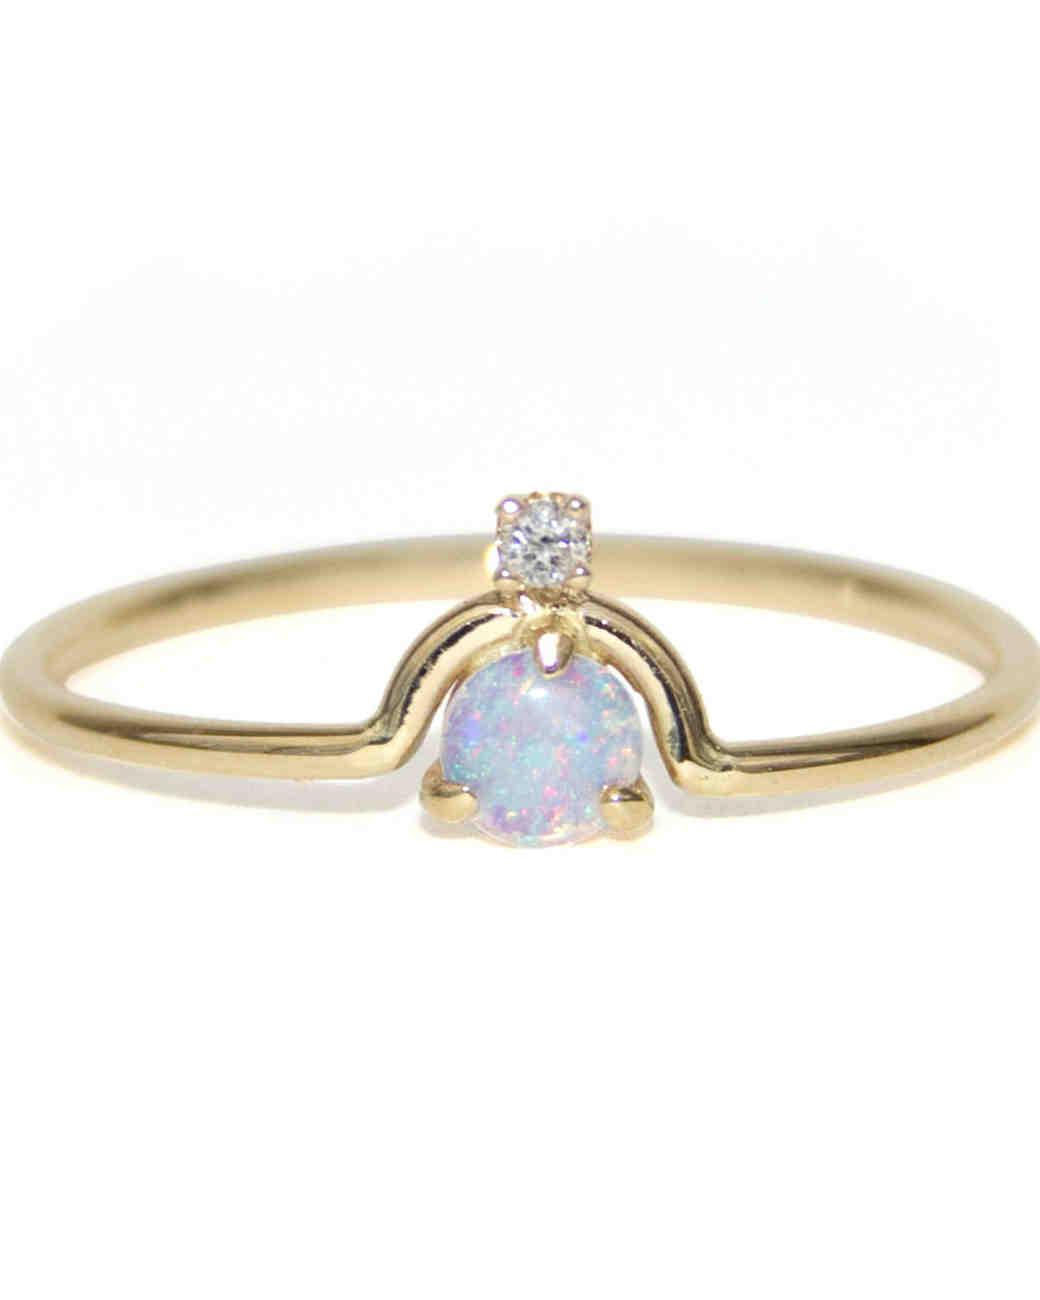 Opal Engagement Rings: Opal Engagement Rings That Are Oh-So Dreamy